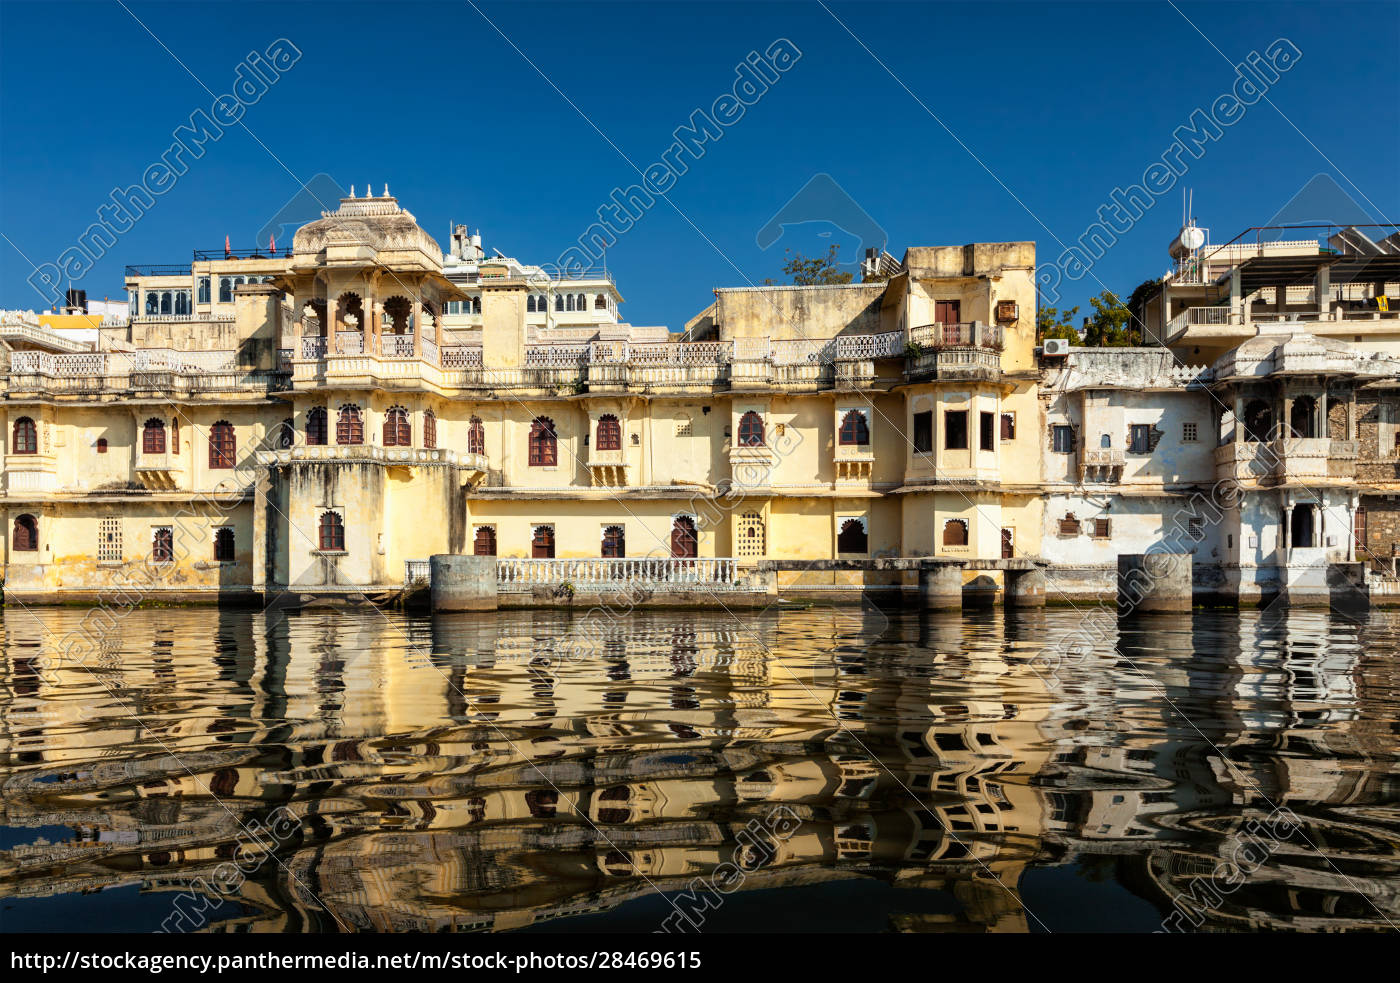 city, palace, am, lake, pichola, udaipur, rajasthan, indien - 28469615